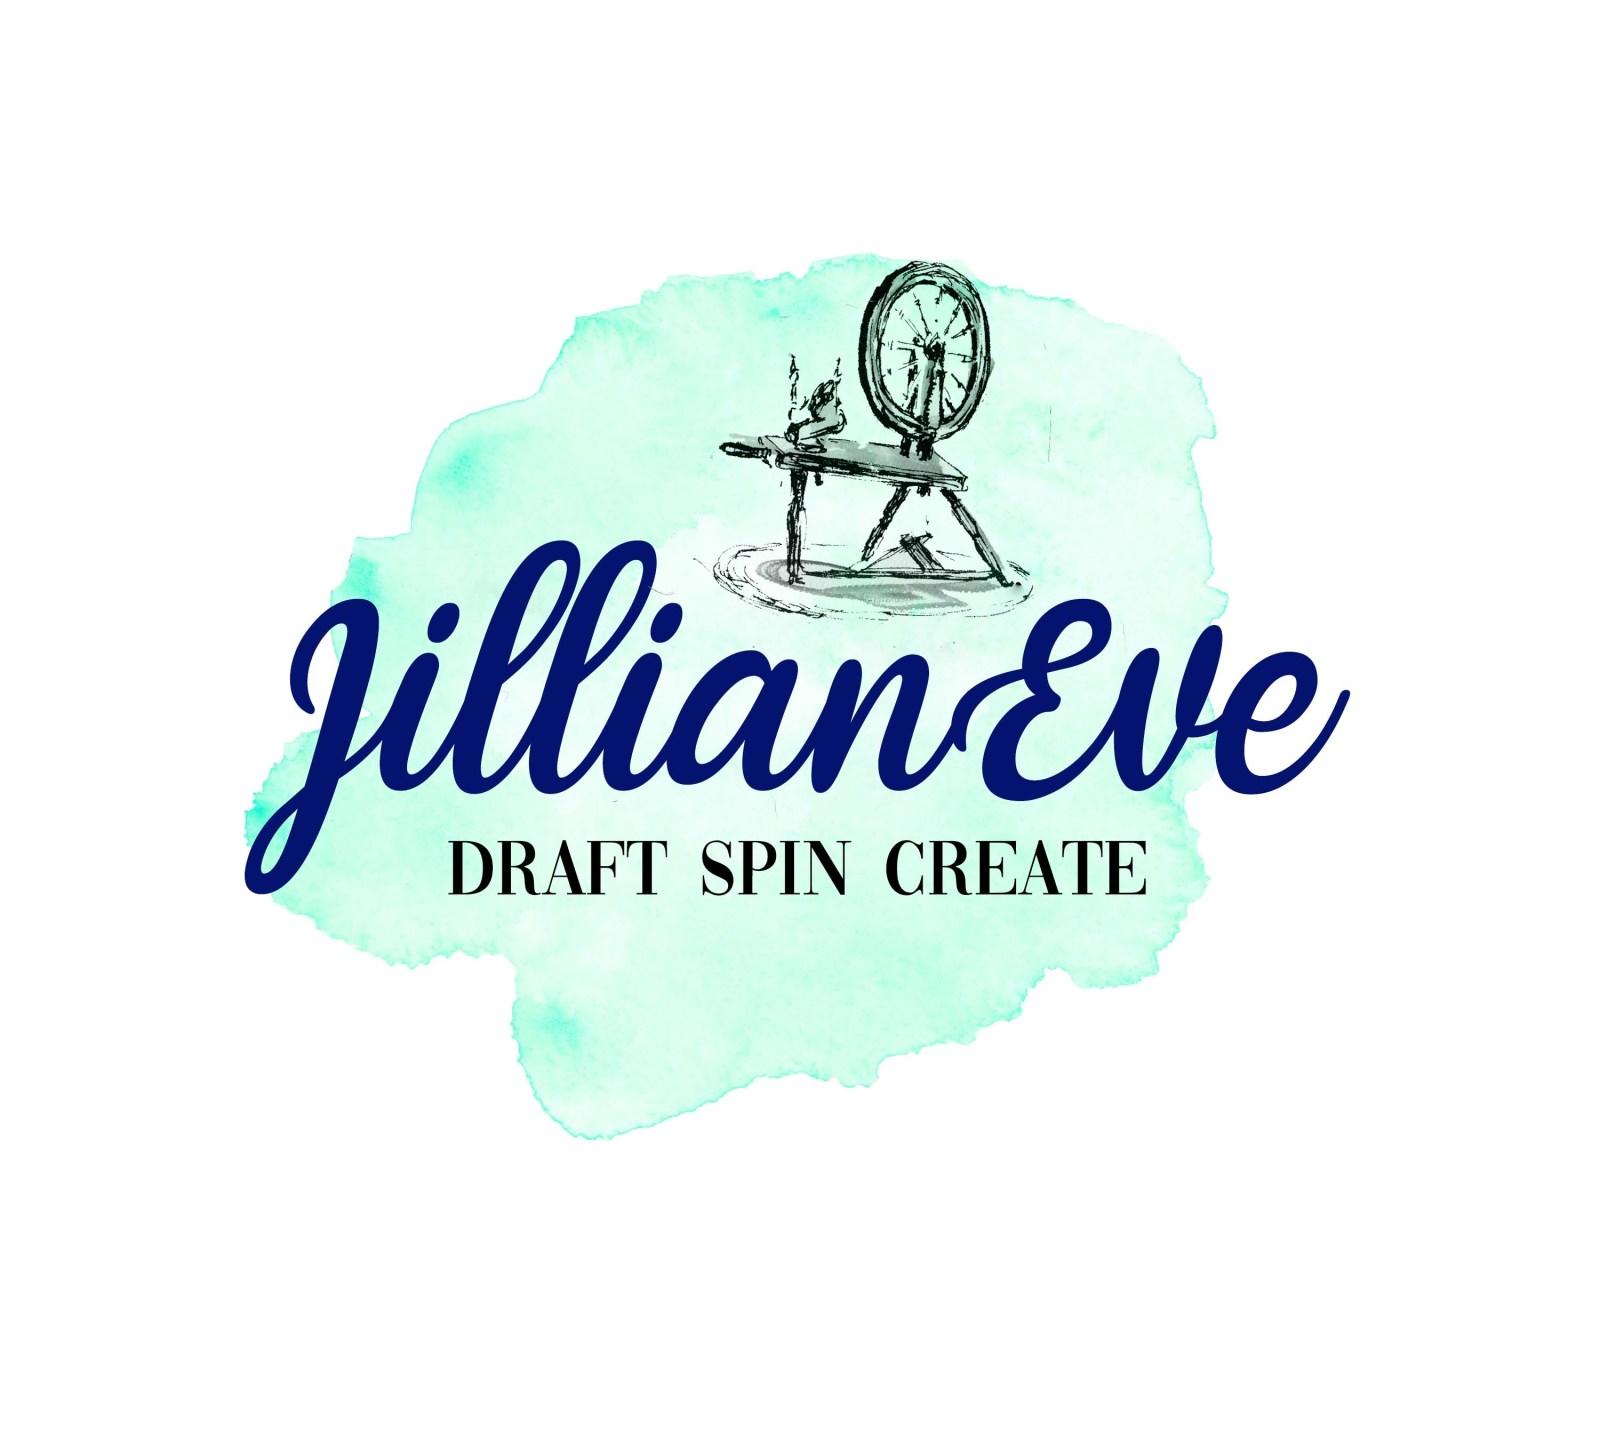 JillianEve Draft Spin Create